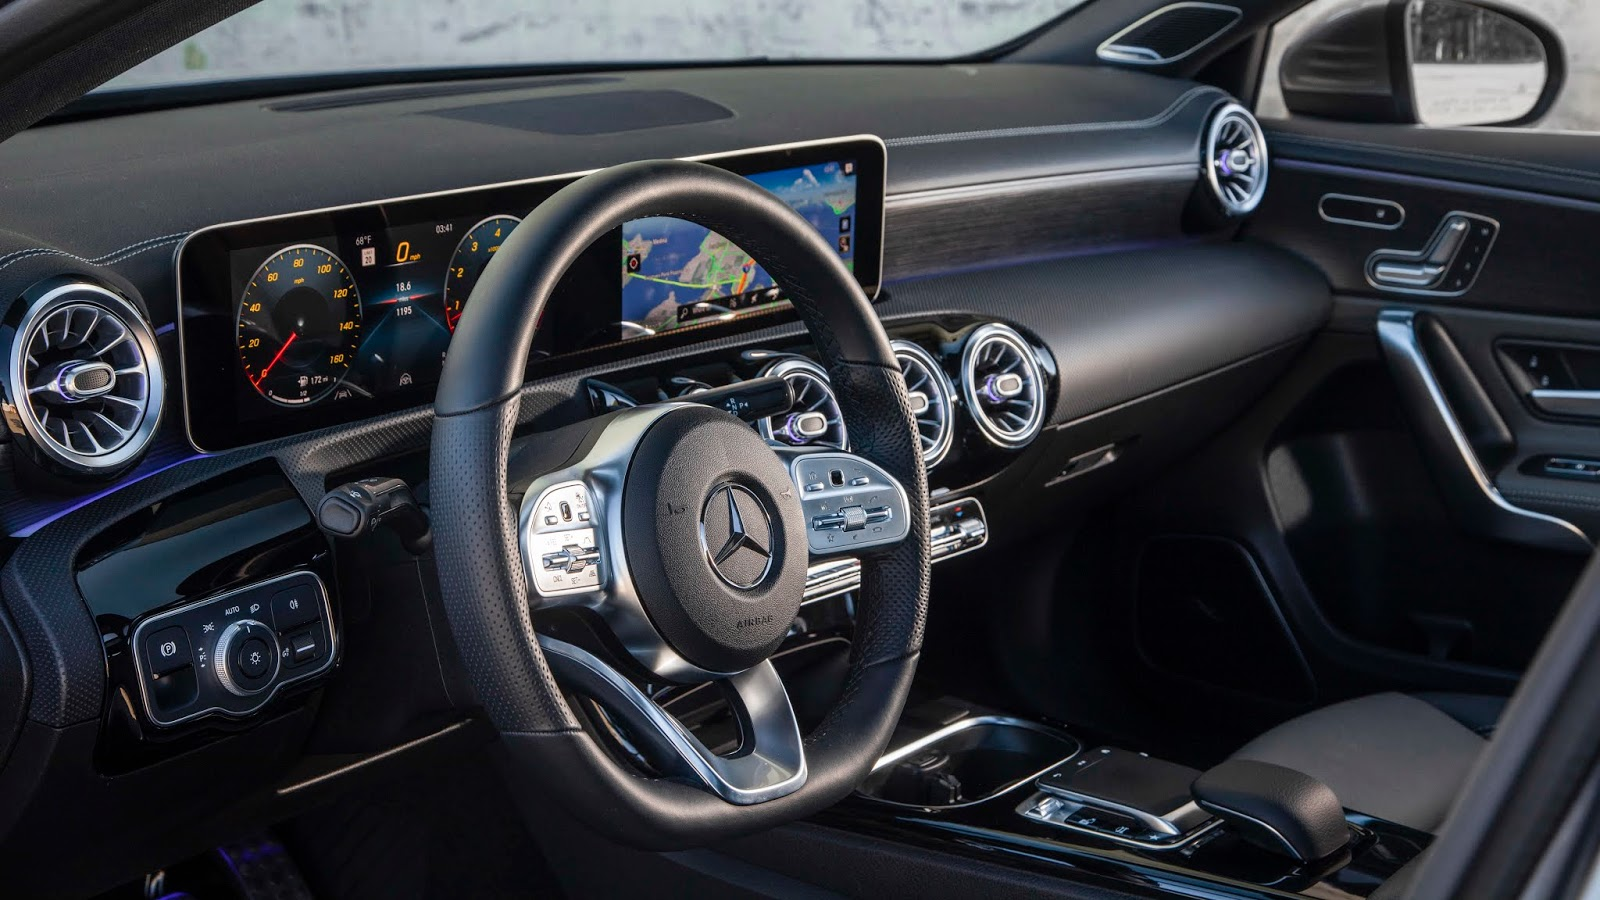 18C0777 015 Από 28.230 ευρώ η τιμή της Mercedes A-Class Sedan Luxury sedan, Mercedes, Mercedes AMG, premium sedan, sedan, zblog, καινούργιο, καινούρια, τιμες